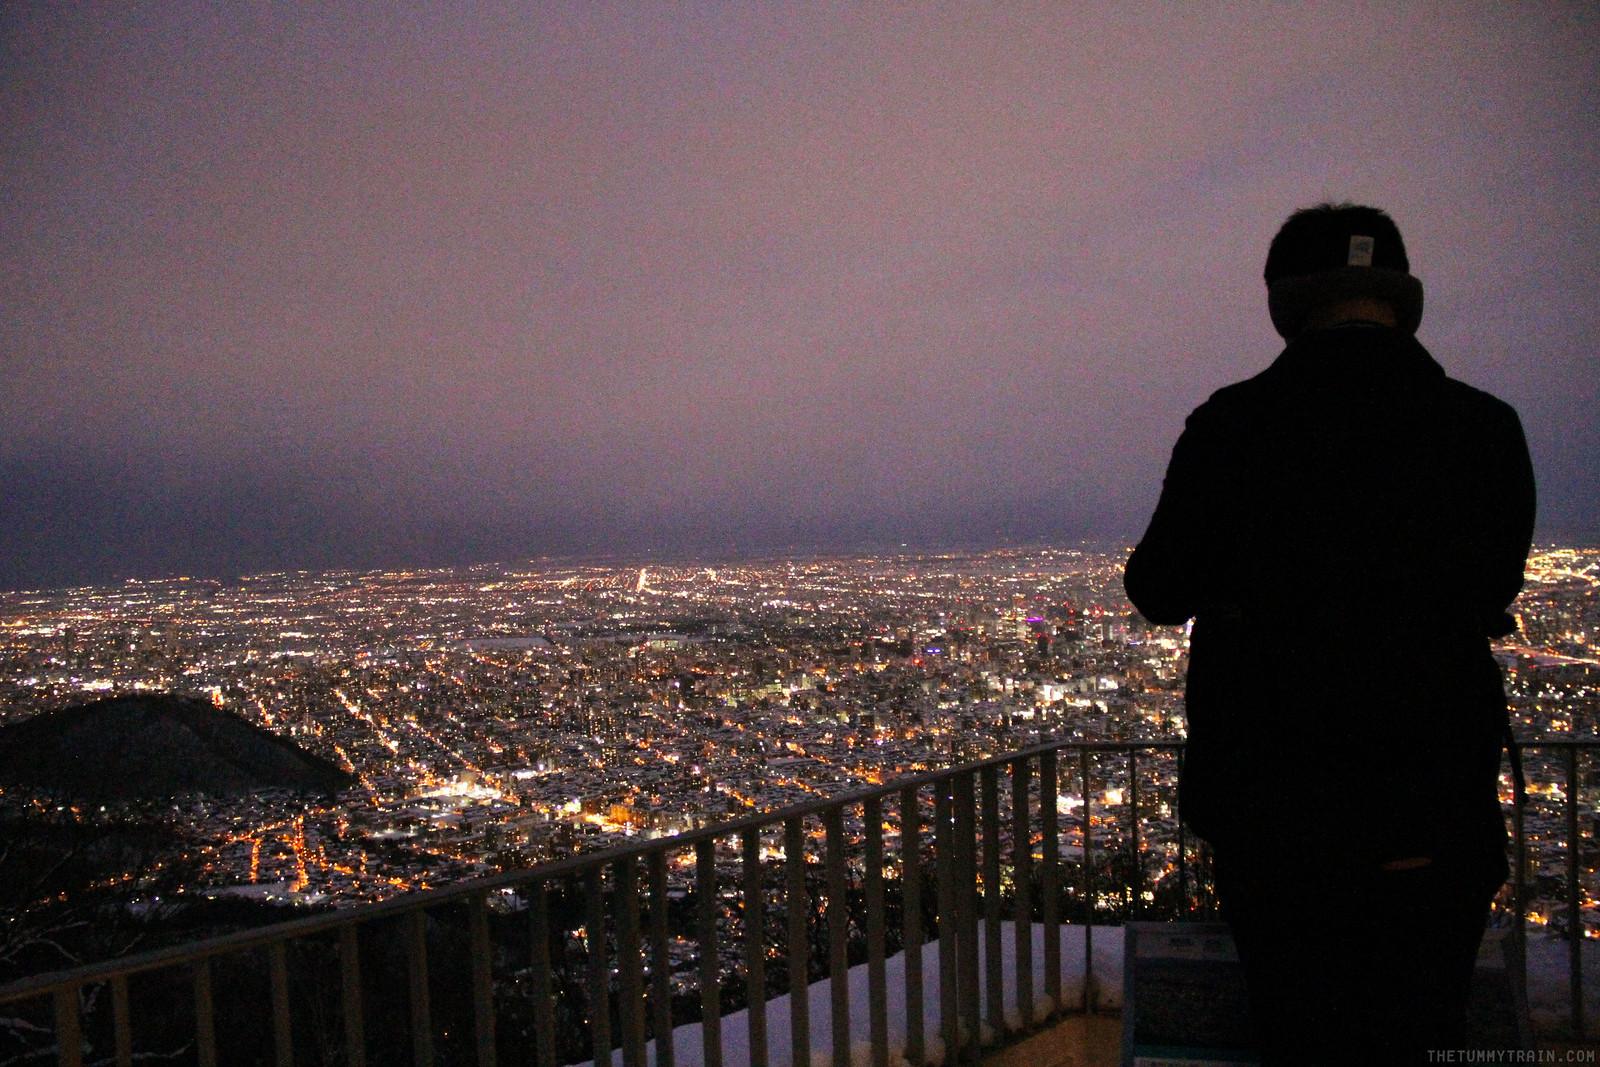 32536412680 d95c46cc7f h - Sapporo Snow And Smile: 8 Unforgettable Winter Experiences in Sapporo City